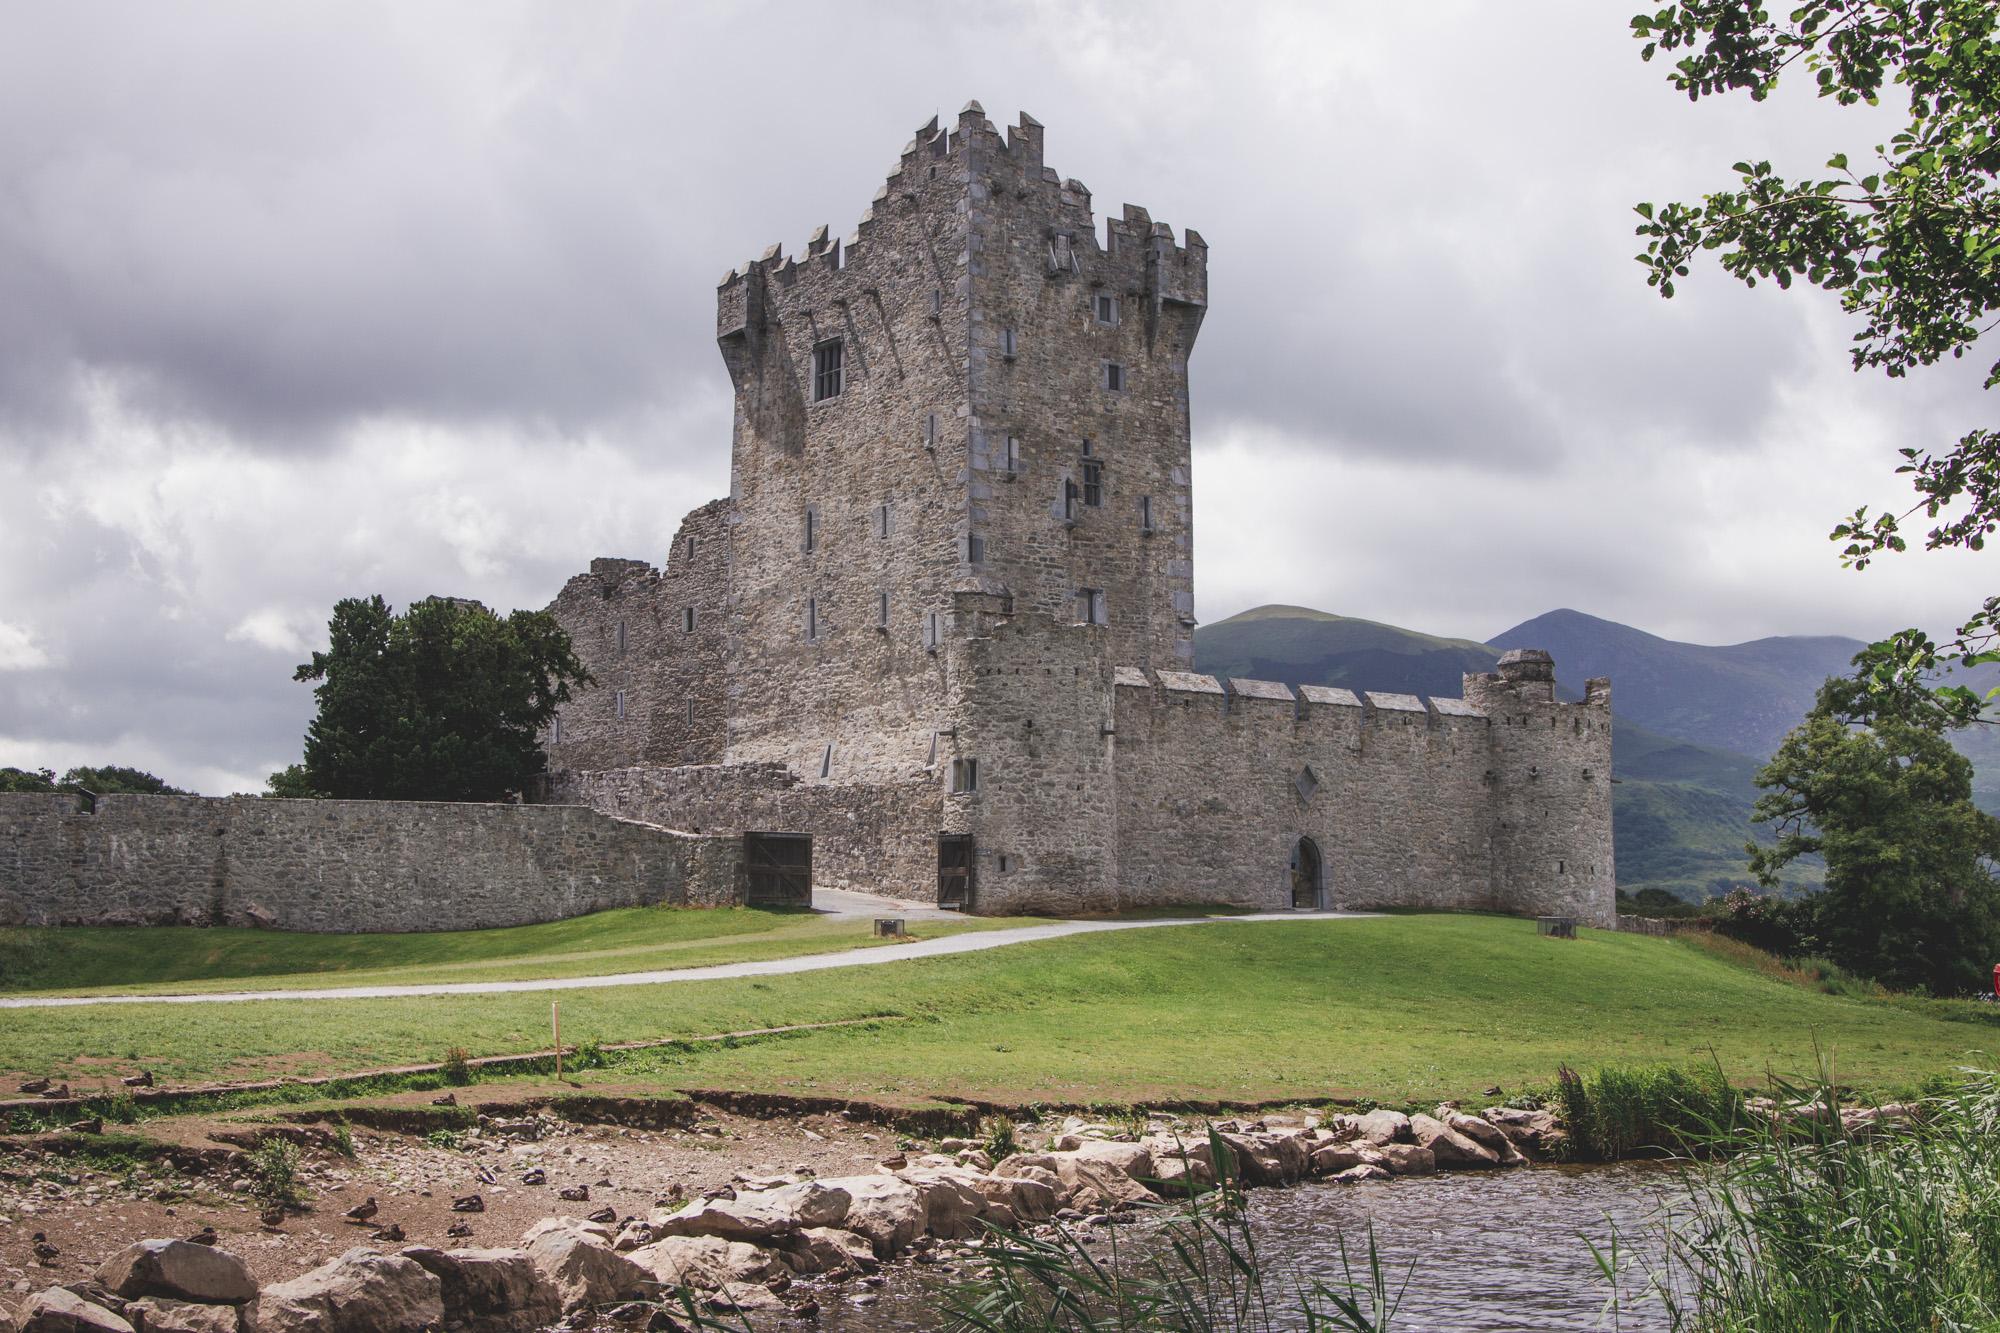 Ross Castle in Killarney National Park in Ireland